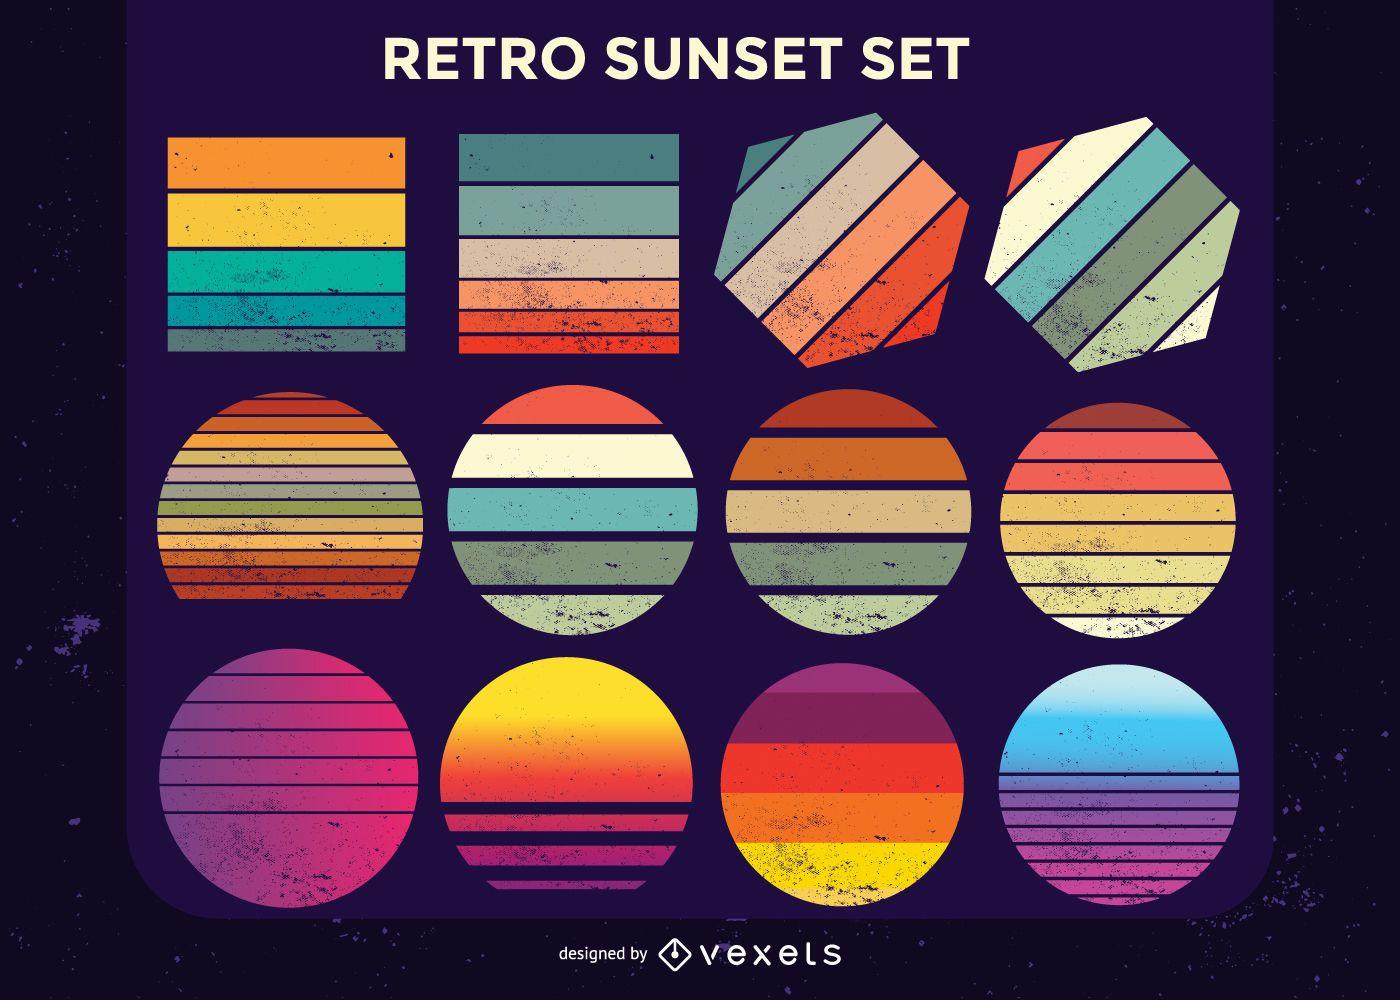 Retro sunset collection